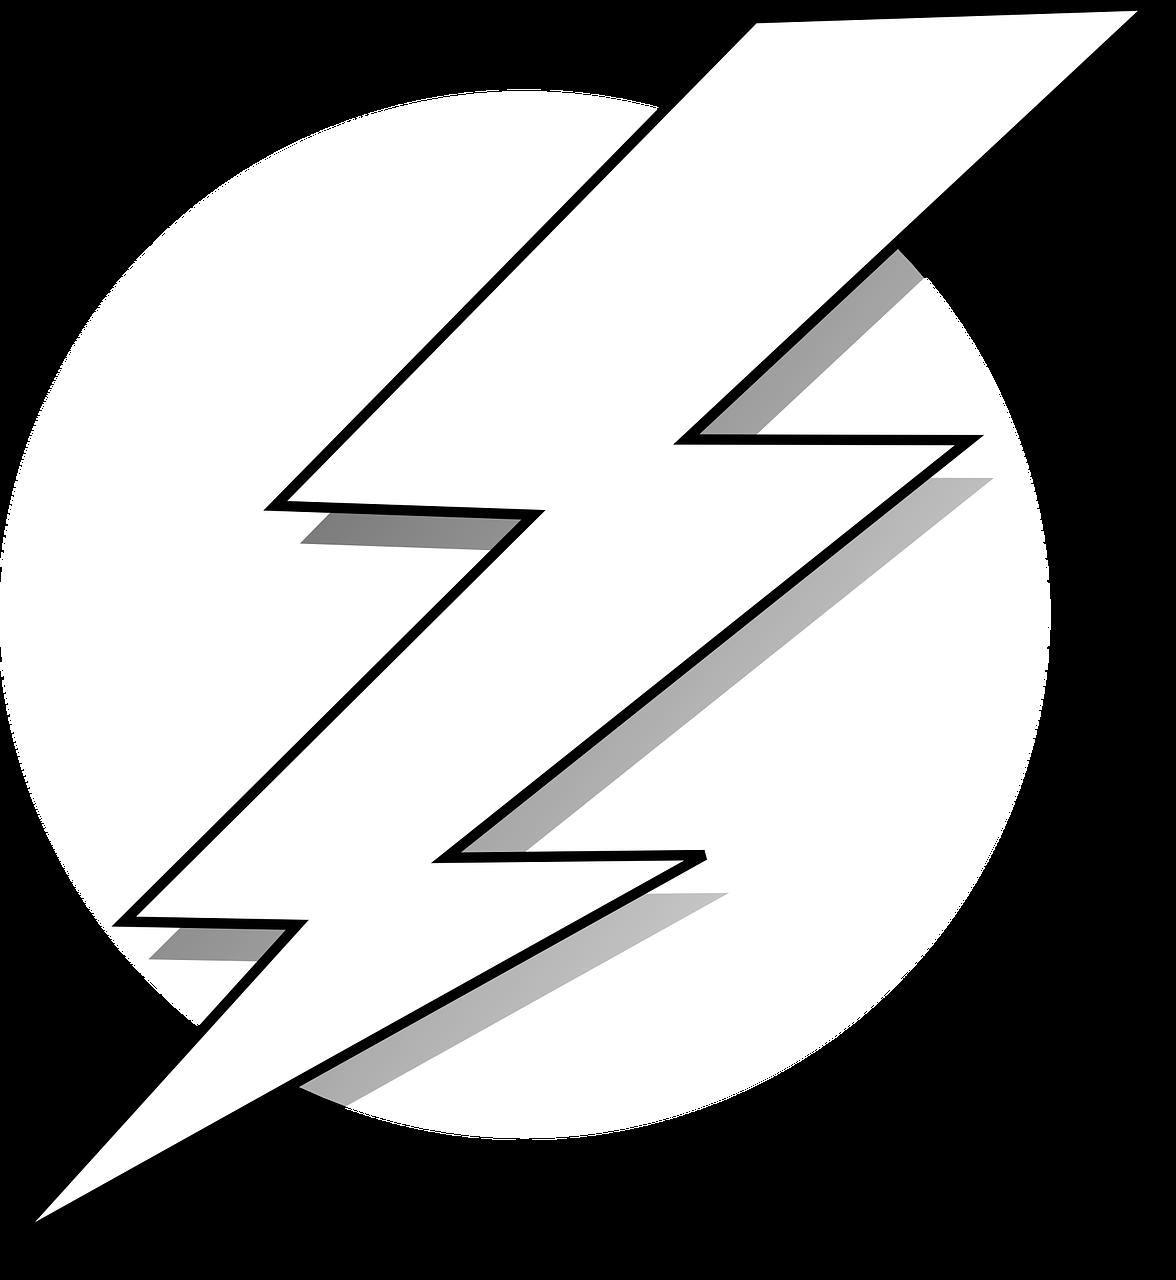 Clipart image of a lightning bolt.